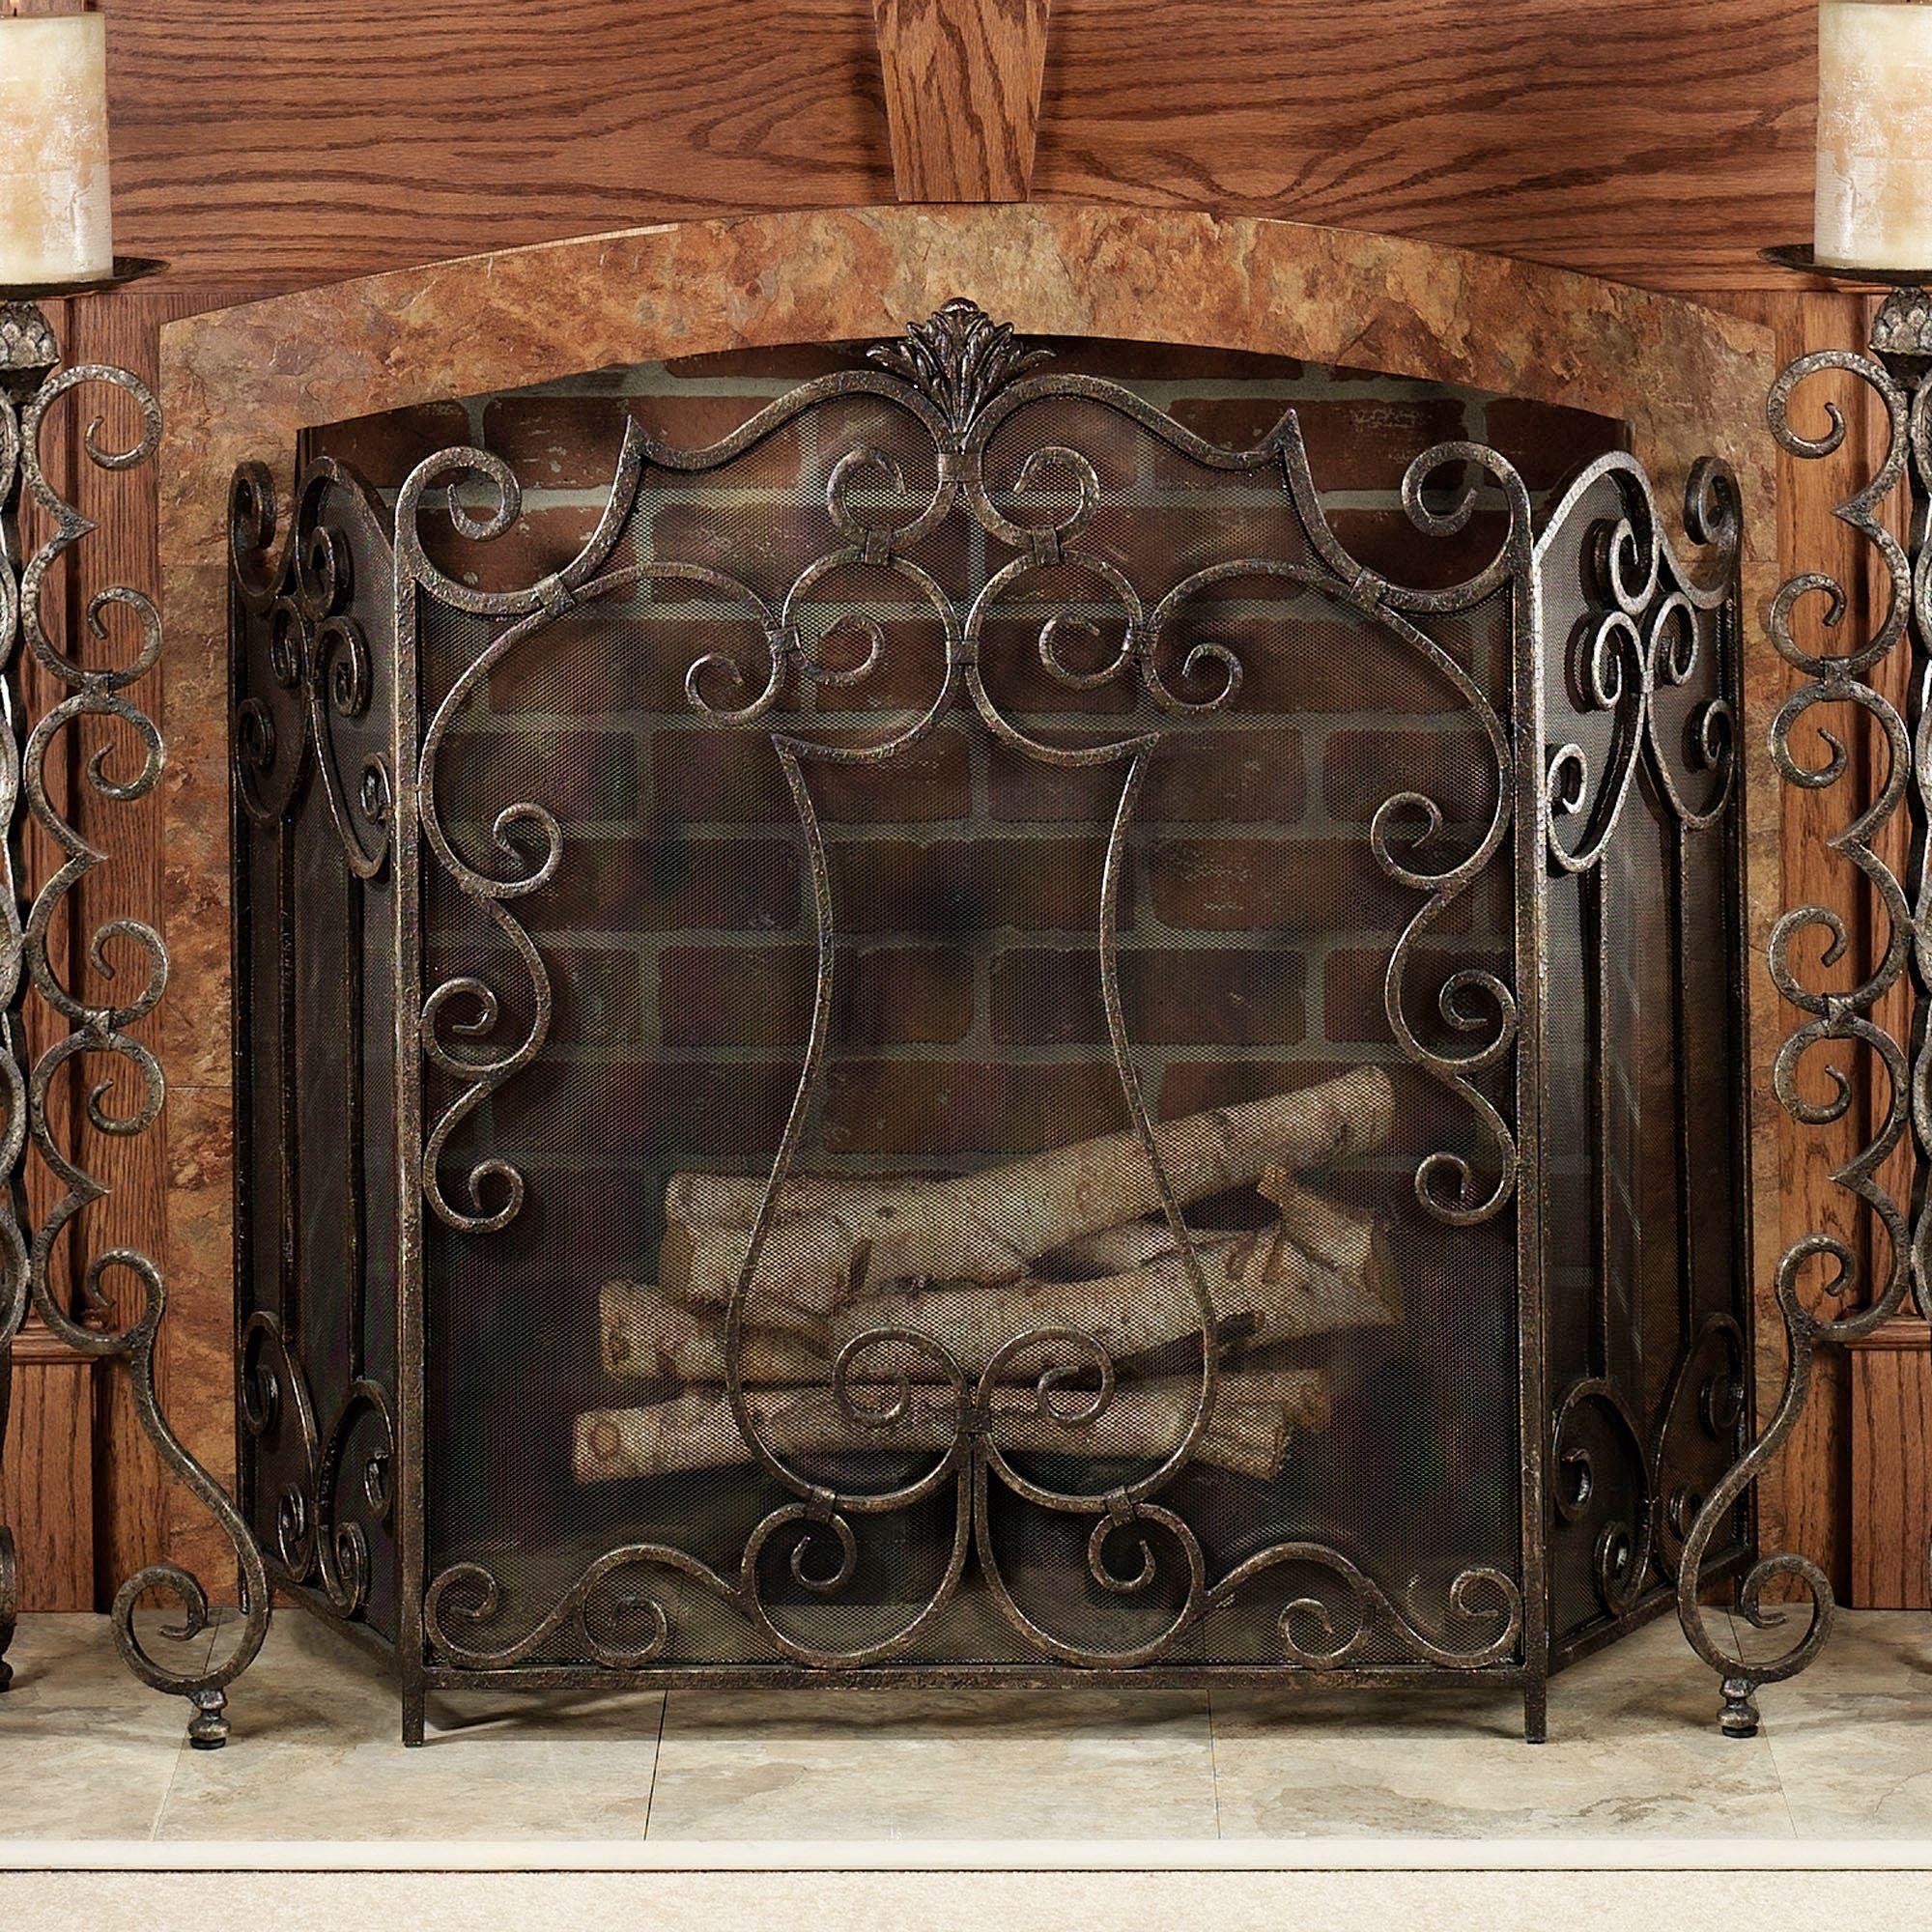 Belleville Fireplace Screen Decorative Fireplace Screens Fireplace Screens Fireplace Screen